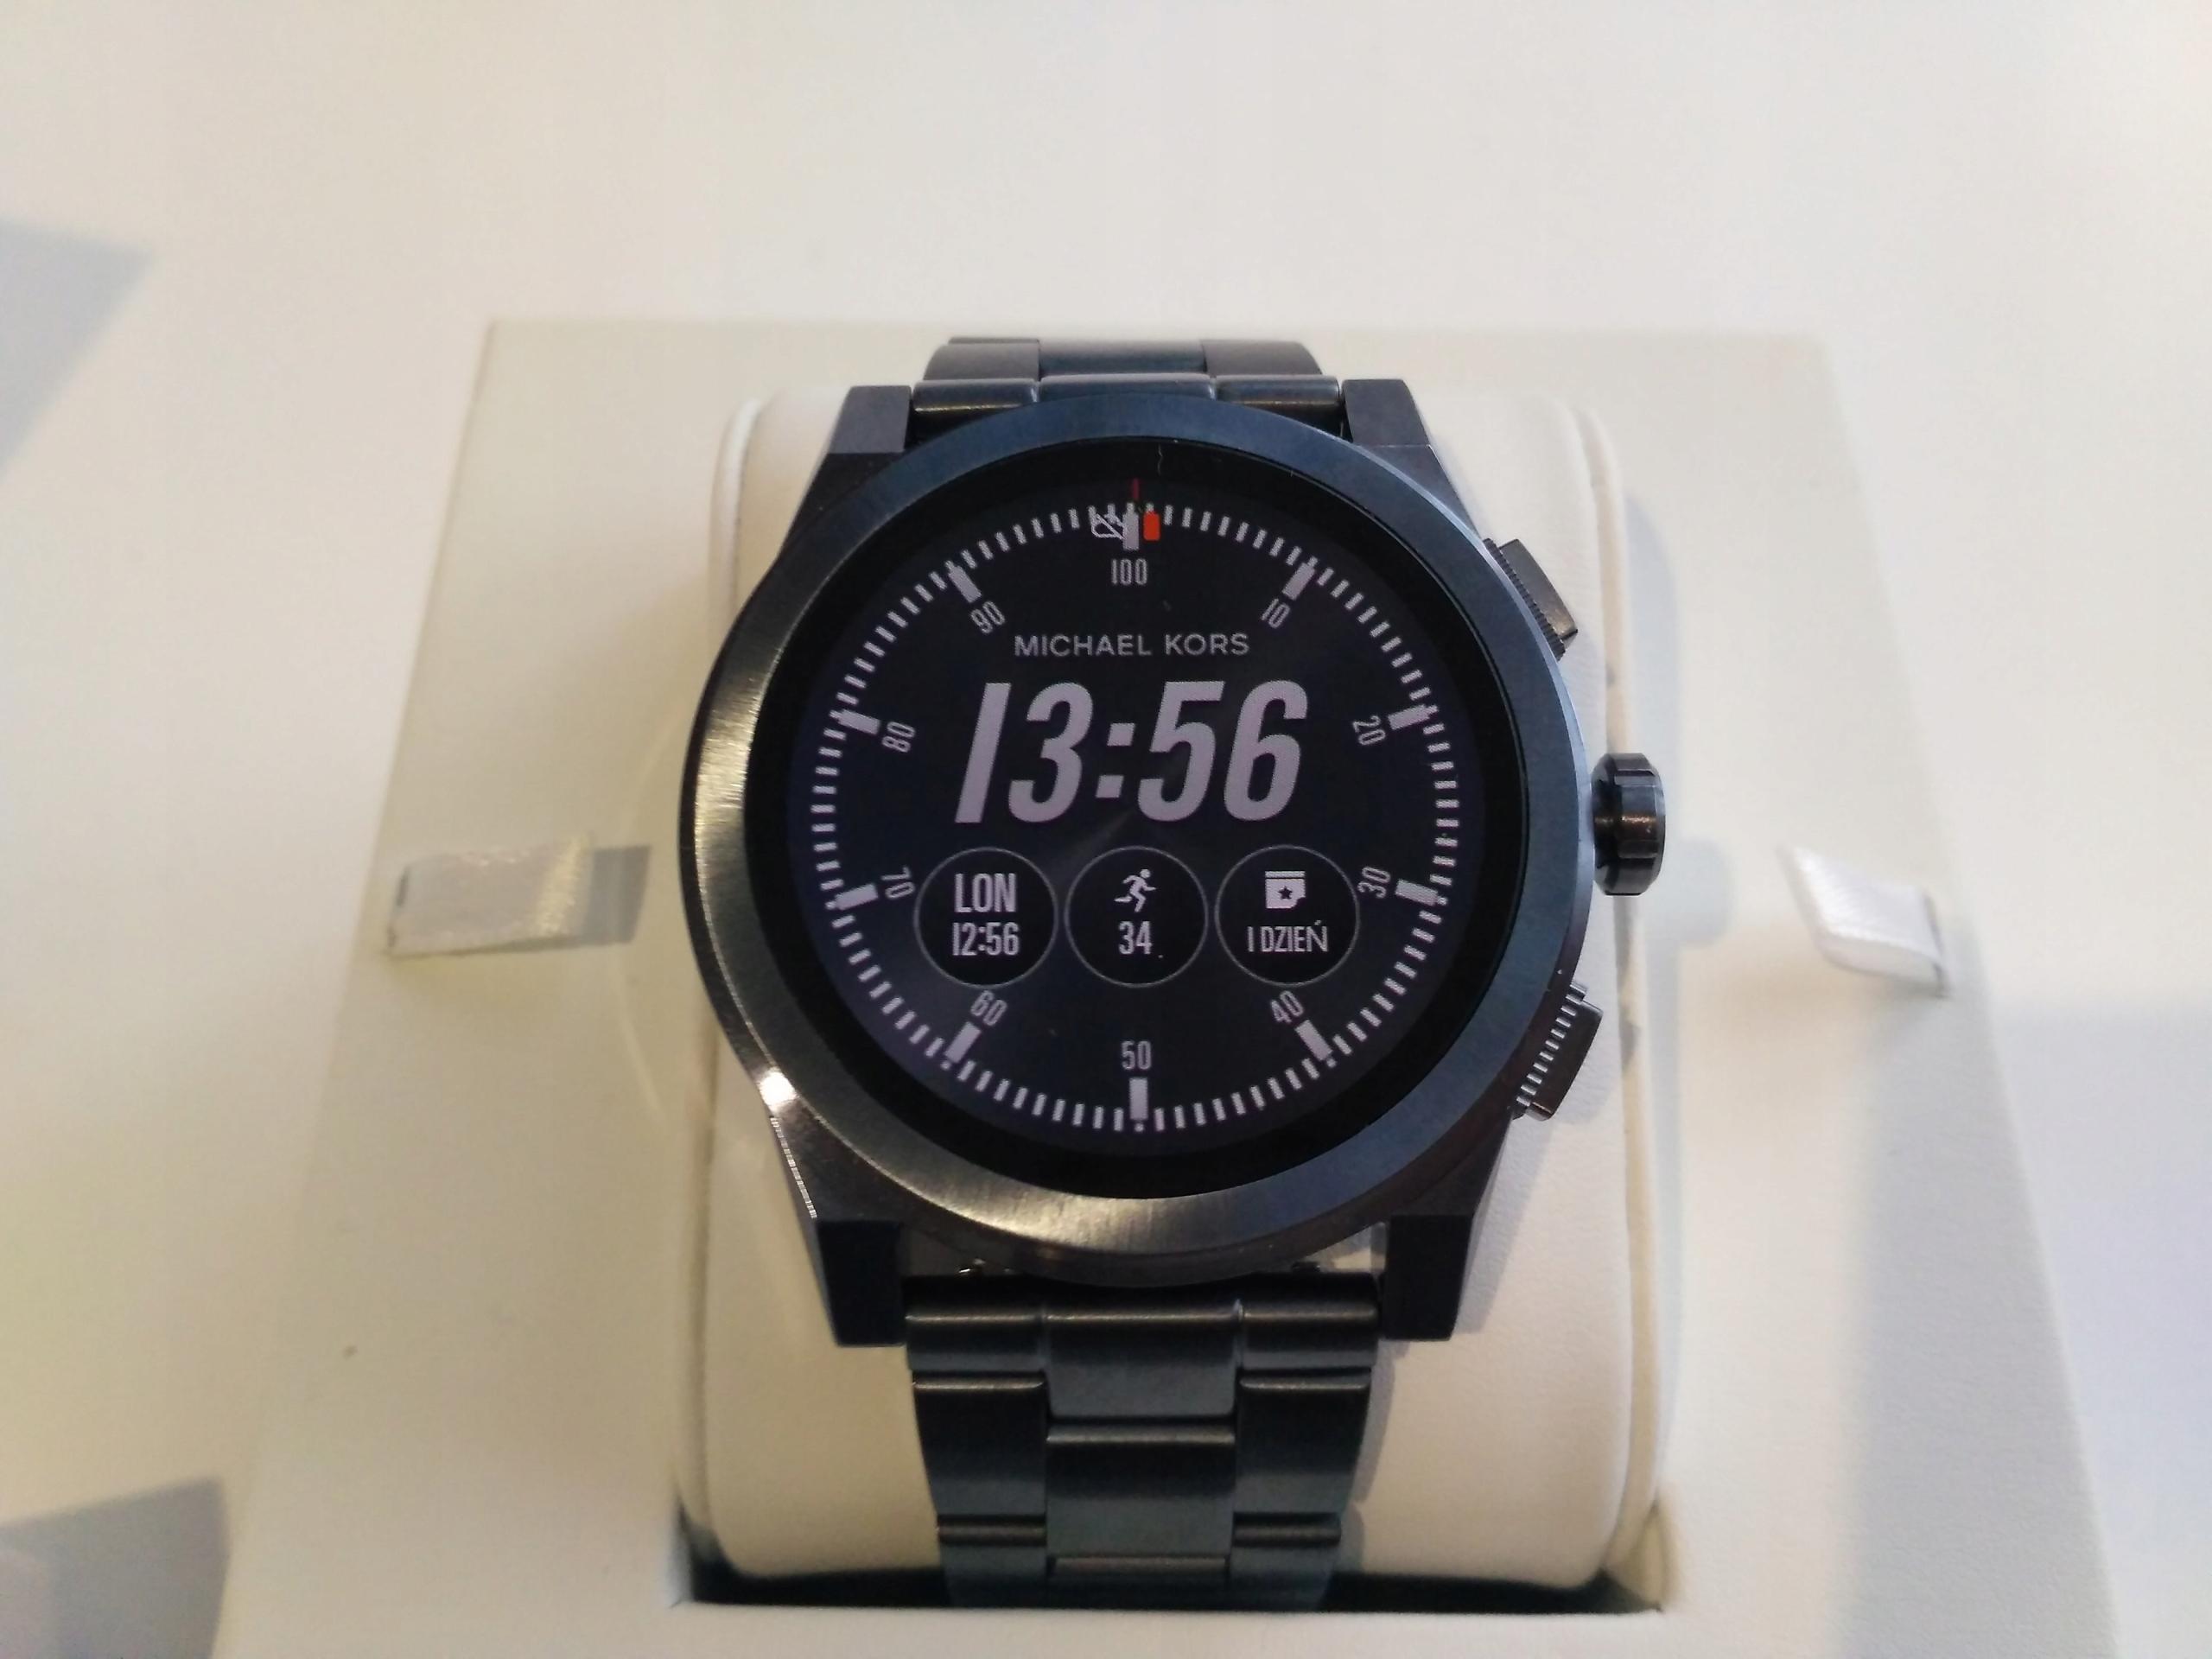 ab352232dca34 michael kors zegarek w Oficjalnym Archiwum Allegro - Strona 55 - archiwum  ofert